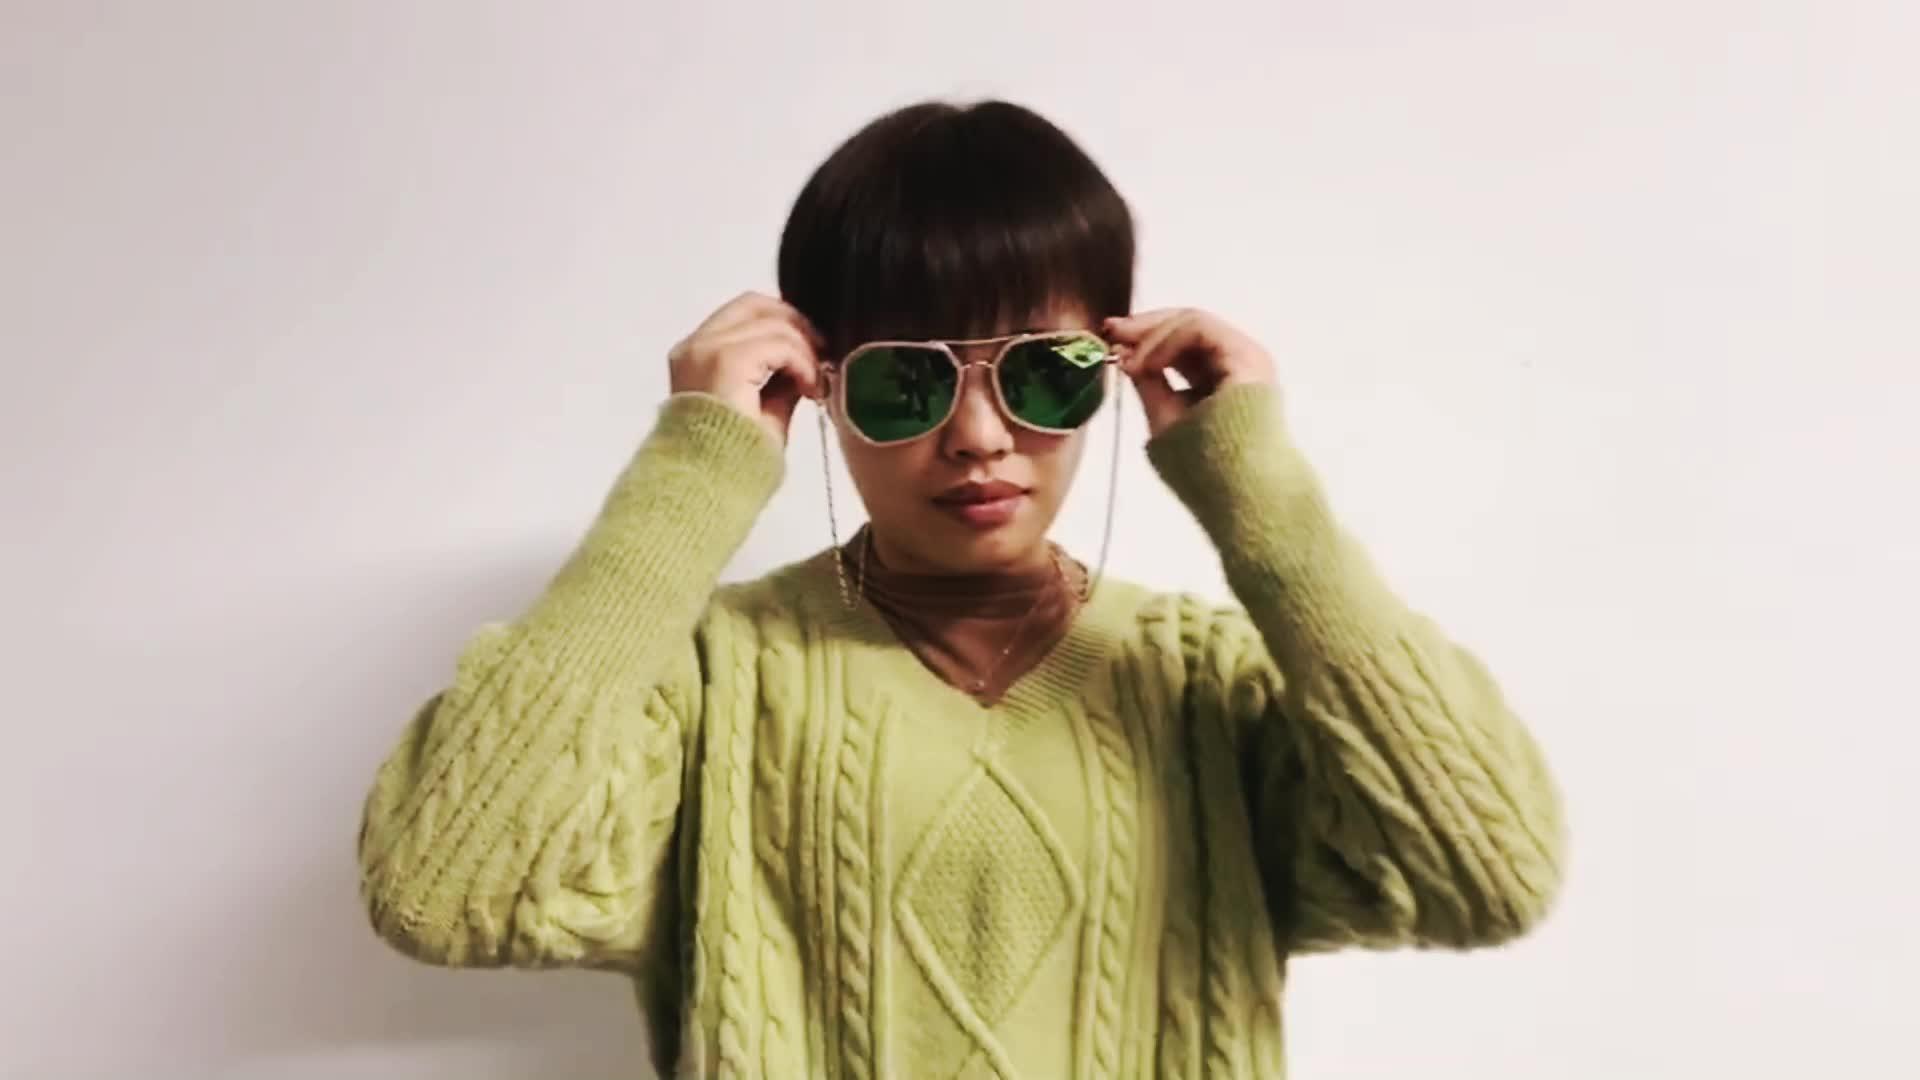 Eyewear Sun Glasses Neck Cord Sunglasses Chain Strap Sports